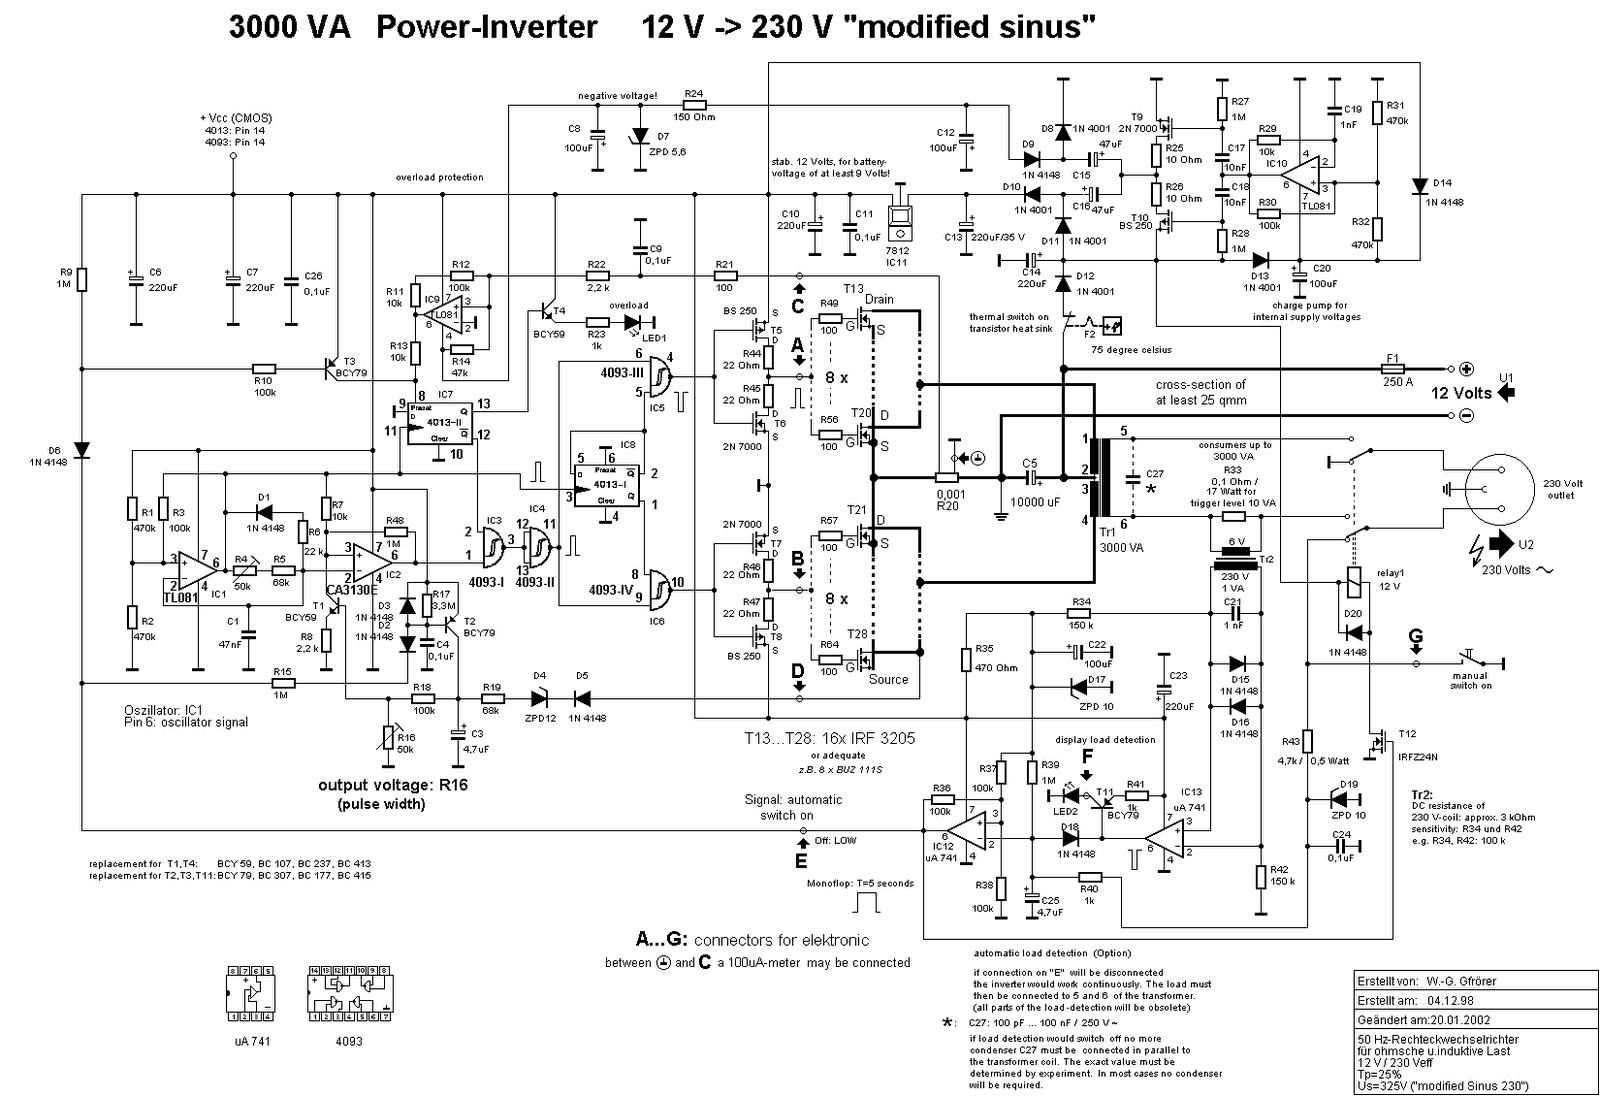 apc wiring diagrams wiring diagram schematics Apc Diagram Simple apc wiring diagrams wiring diagram vmware diagram apc wiring diagrams